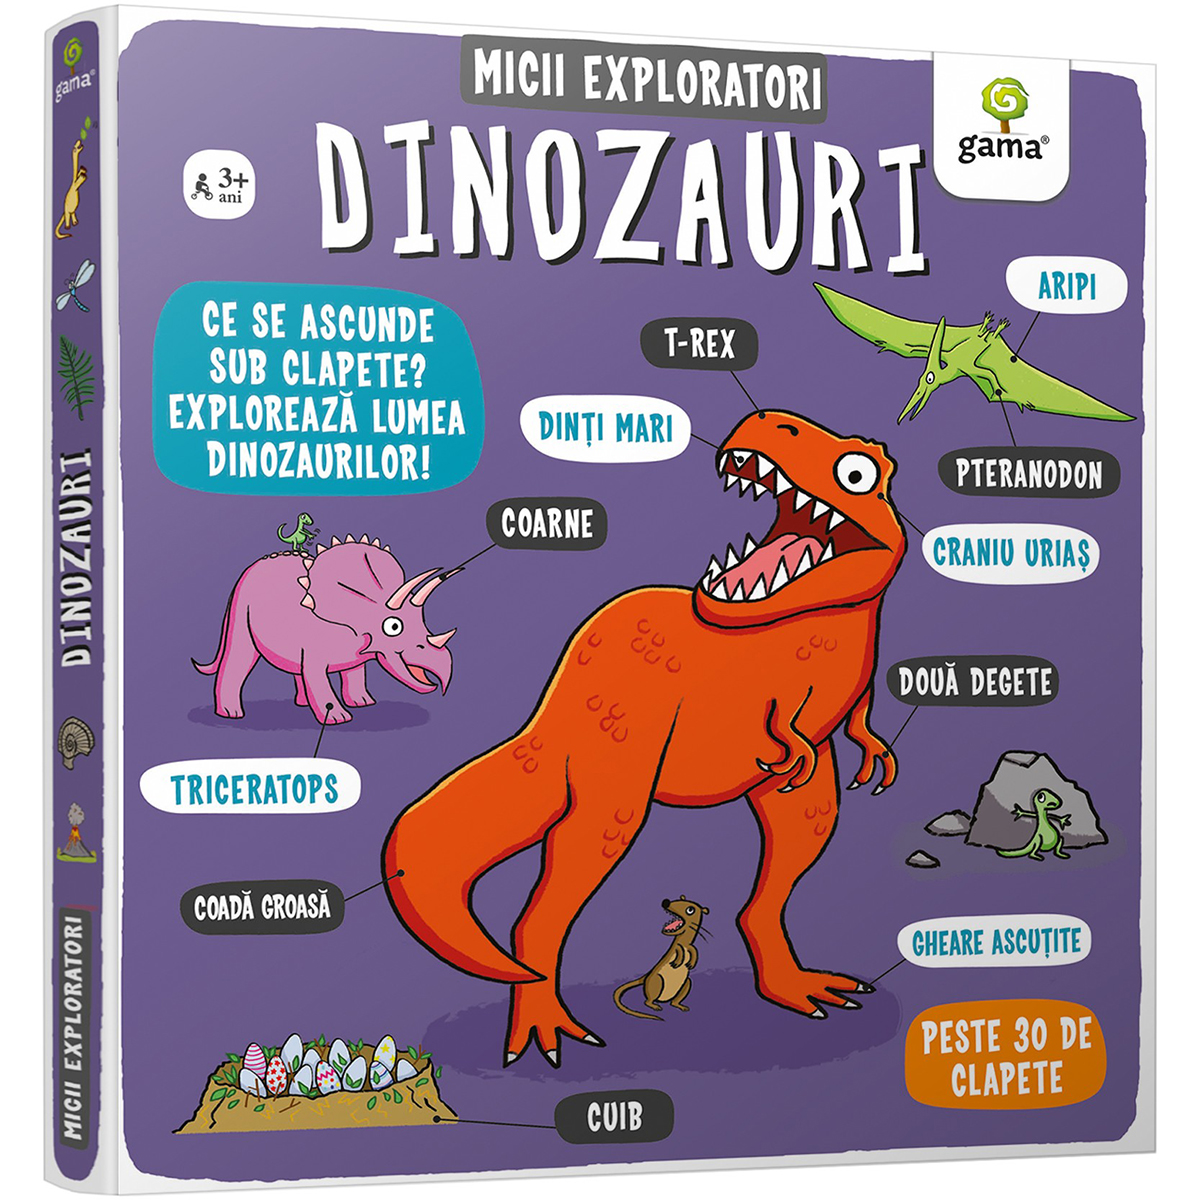 Carte Editura Gama, Micii exploratori, Dinozauri